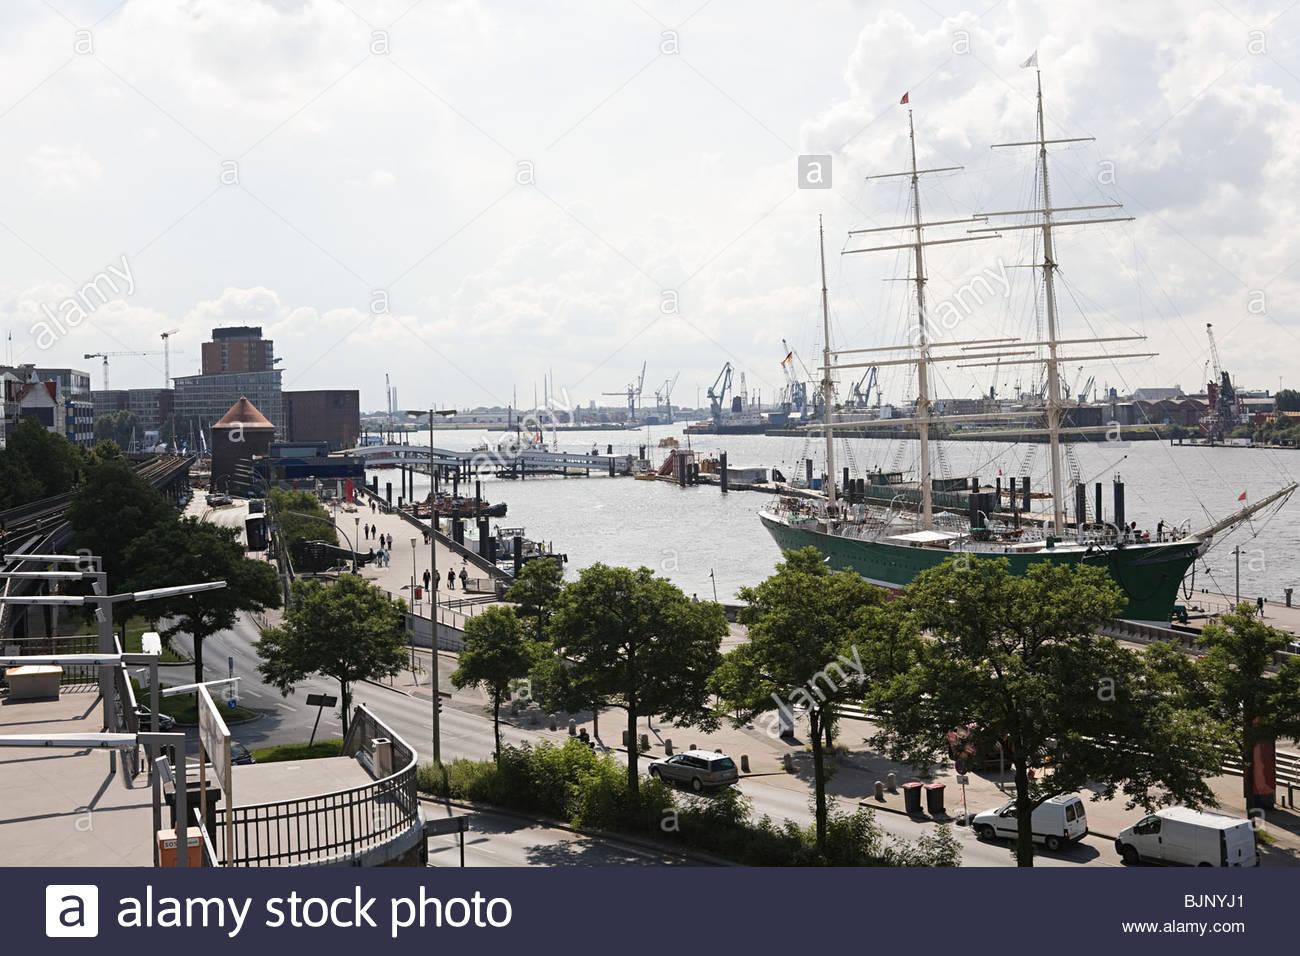 Ship in hamburg harbour Stock Photo